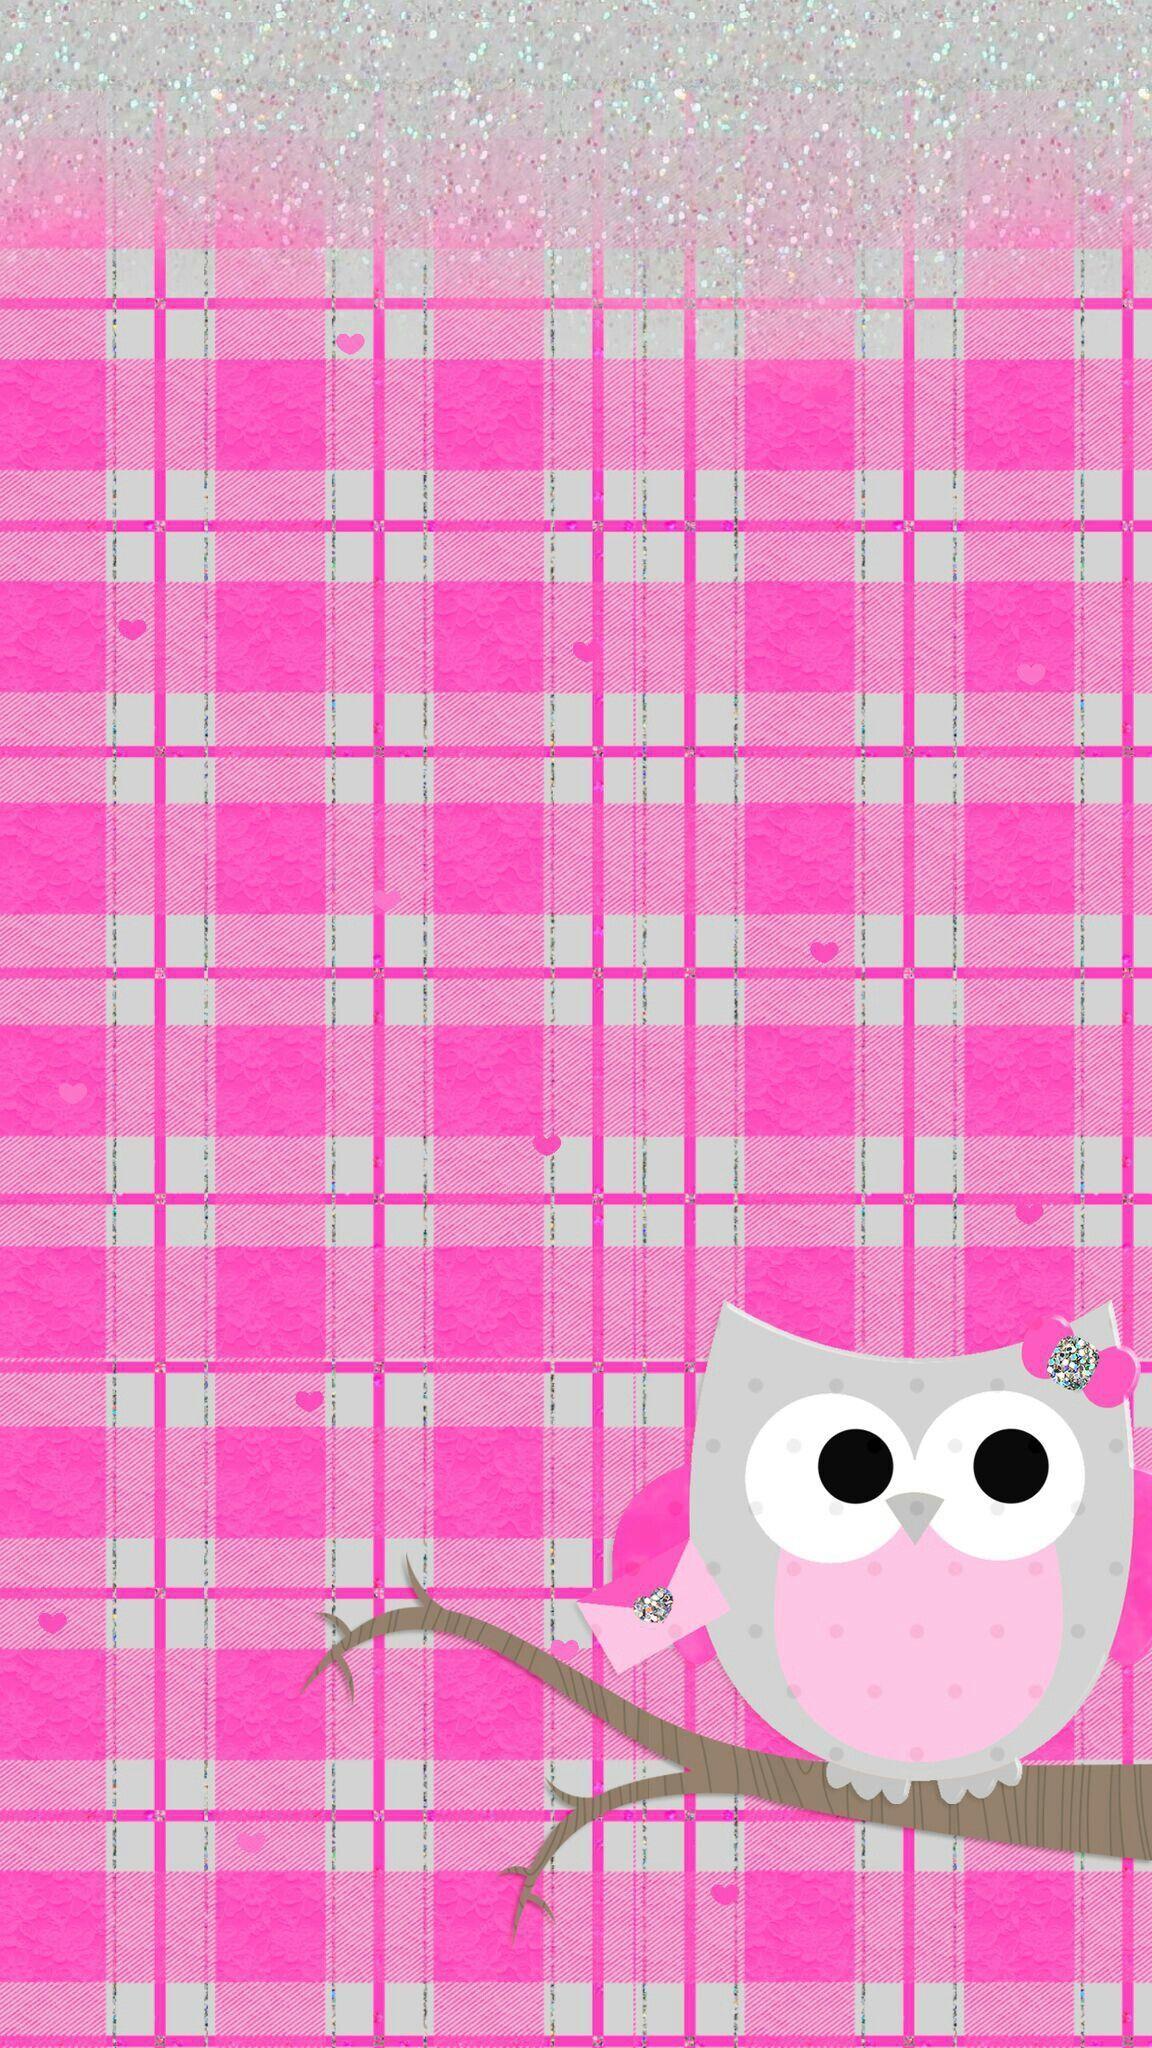 Paling Bagus 25+ Gambar Wallpaper Lucu Warna Pink Richa